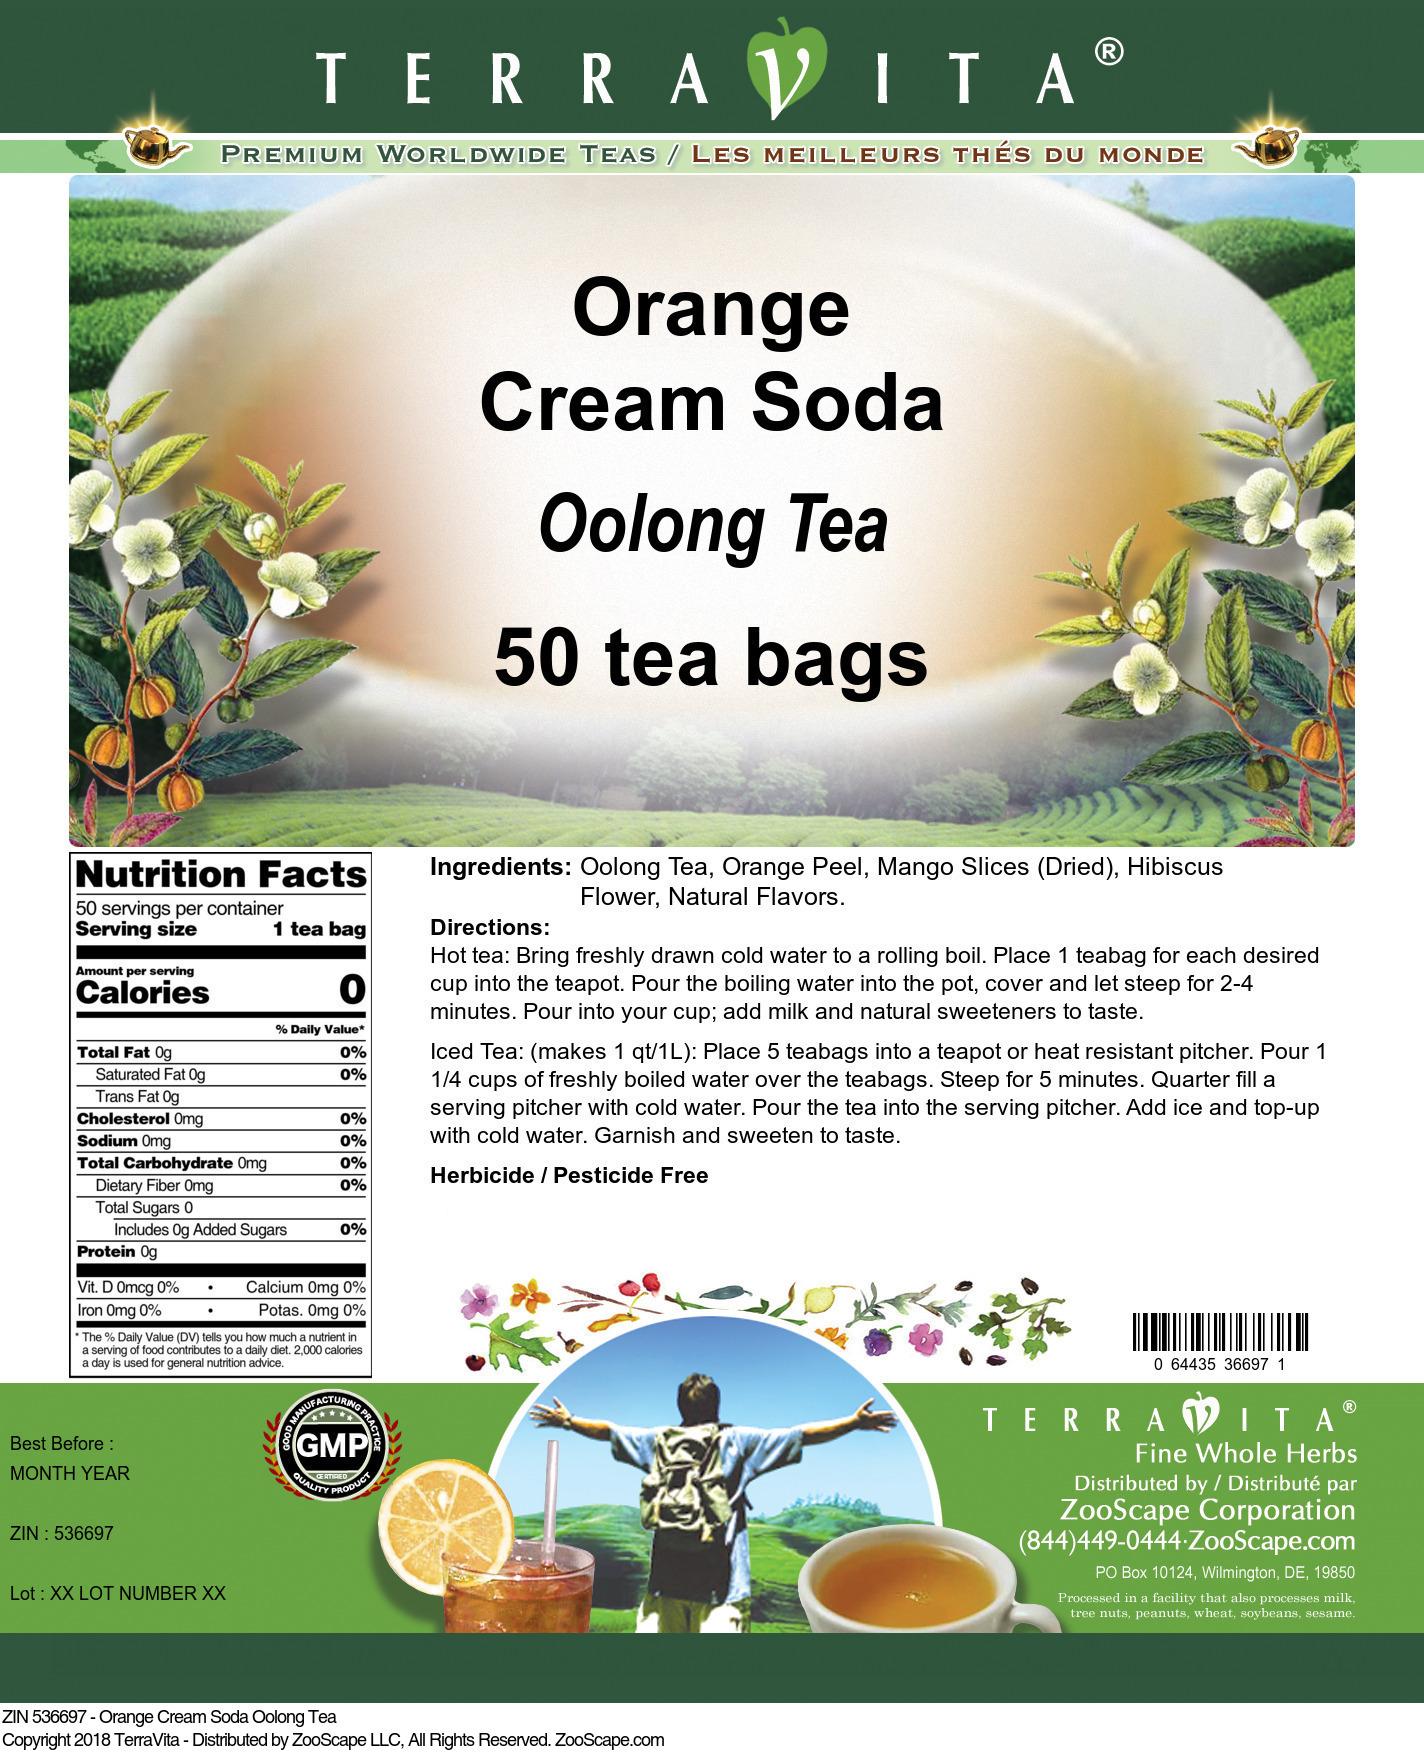 Orange Cream Soda Oolong Tea